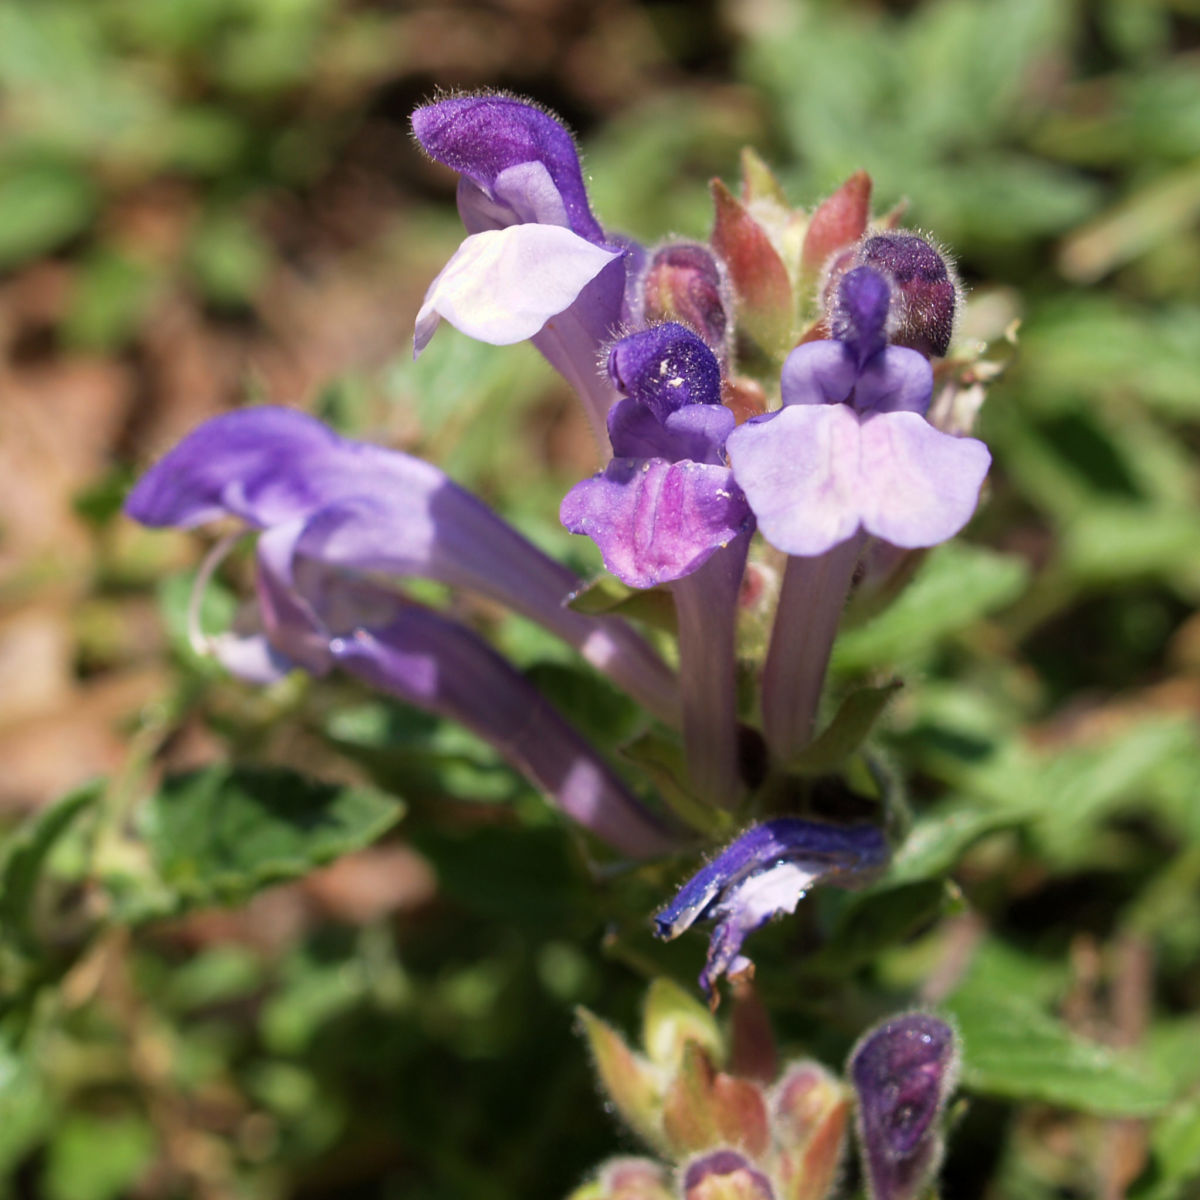 Hallers Spitzkiel Bluete weiss lila Oxytropis halleri